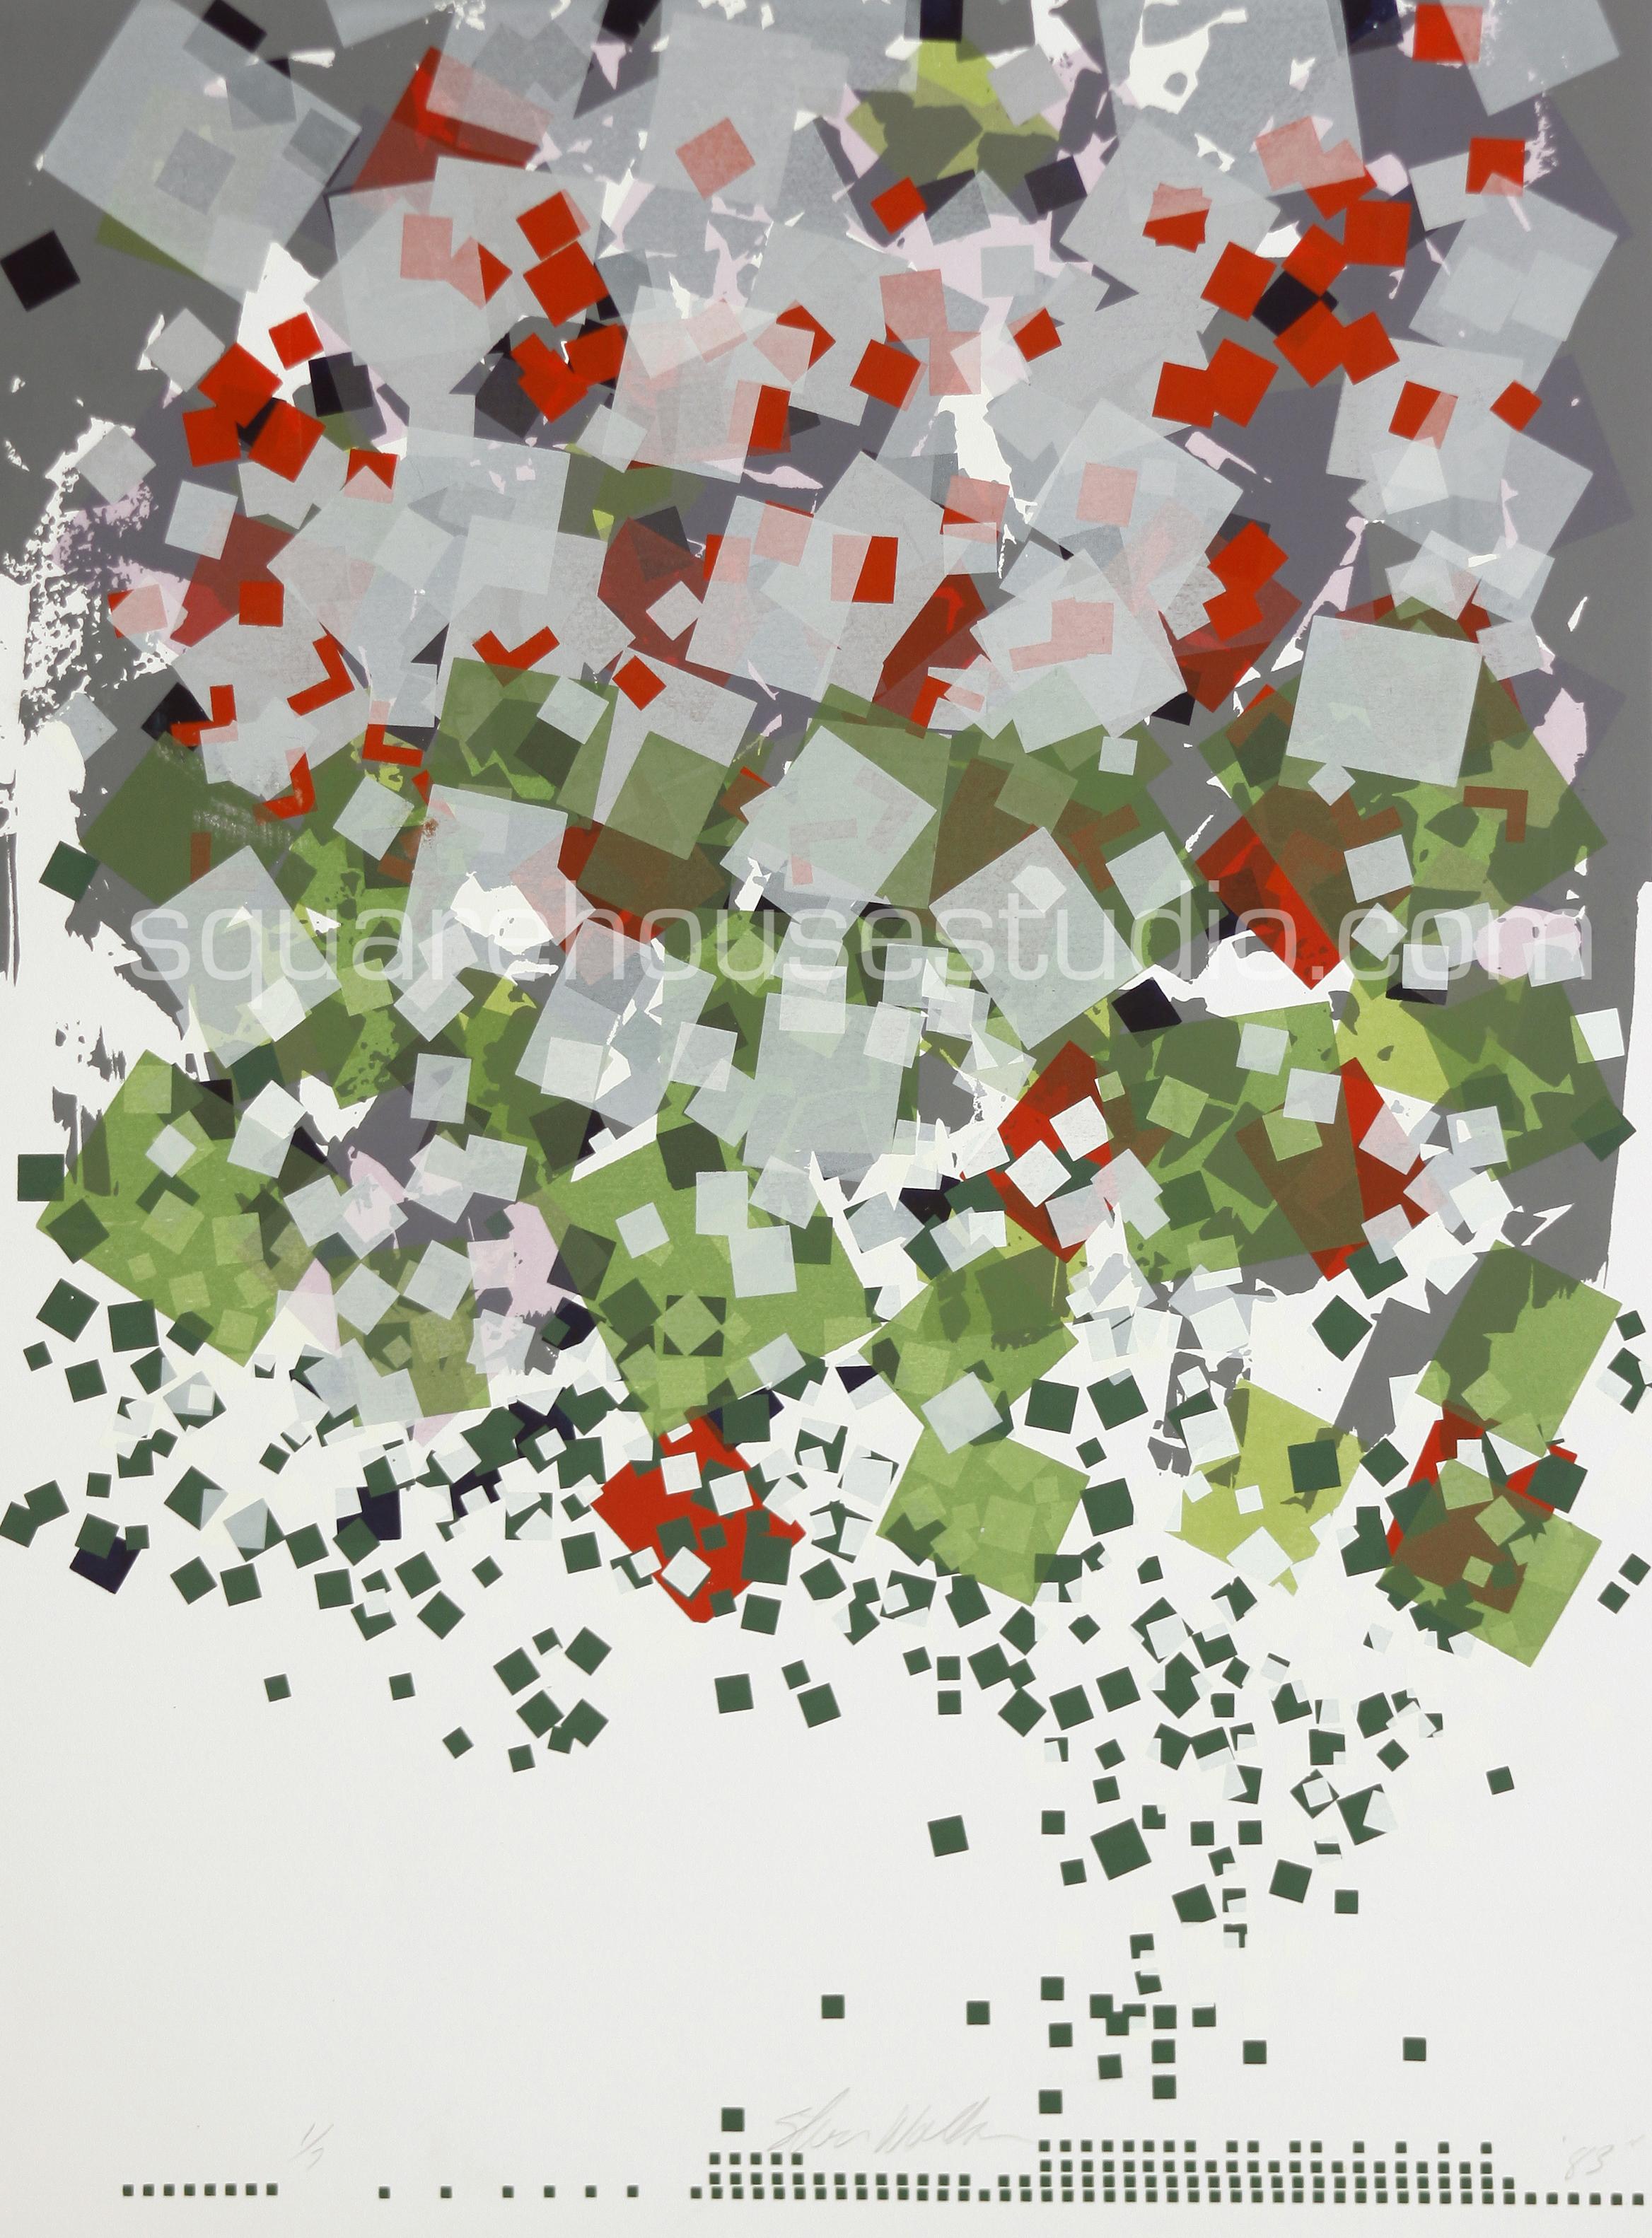 "Confetti , 22"" x 32,"" original edition, $625 framed / $475 unframed, Available as giclée print—$450 framed / $300 unframed"